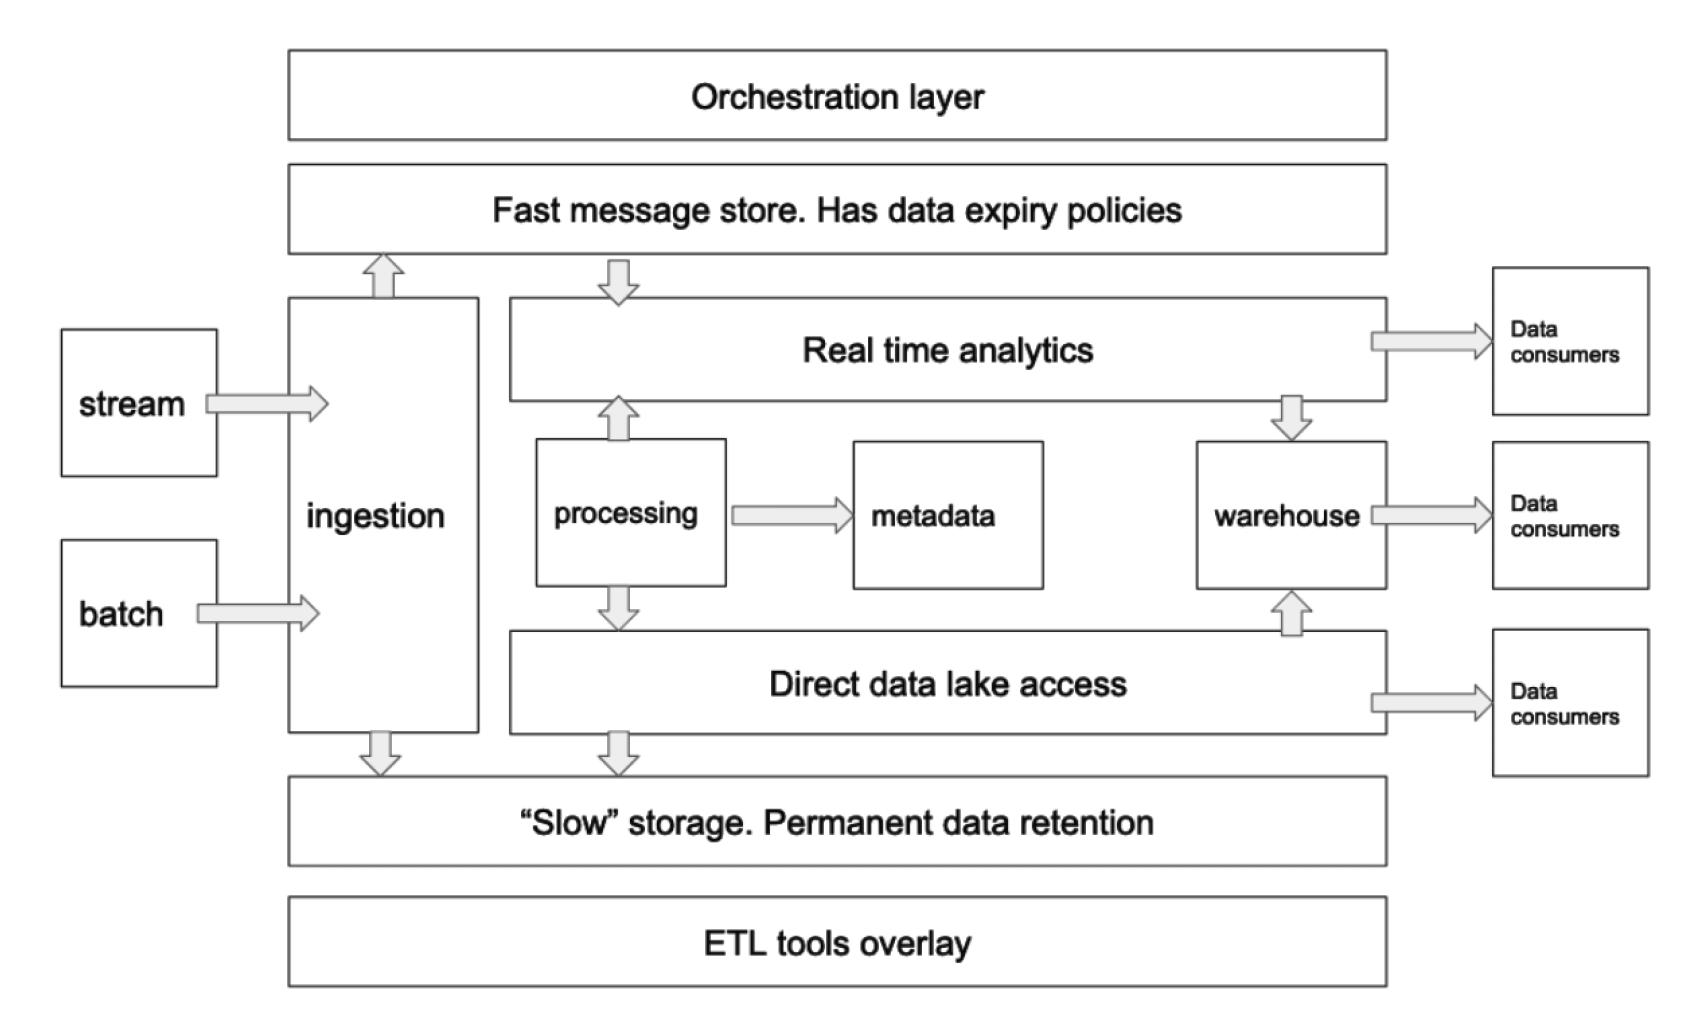 Cloud data platform layered architecture